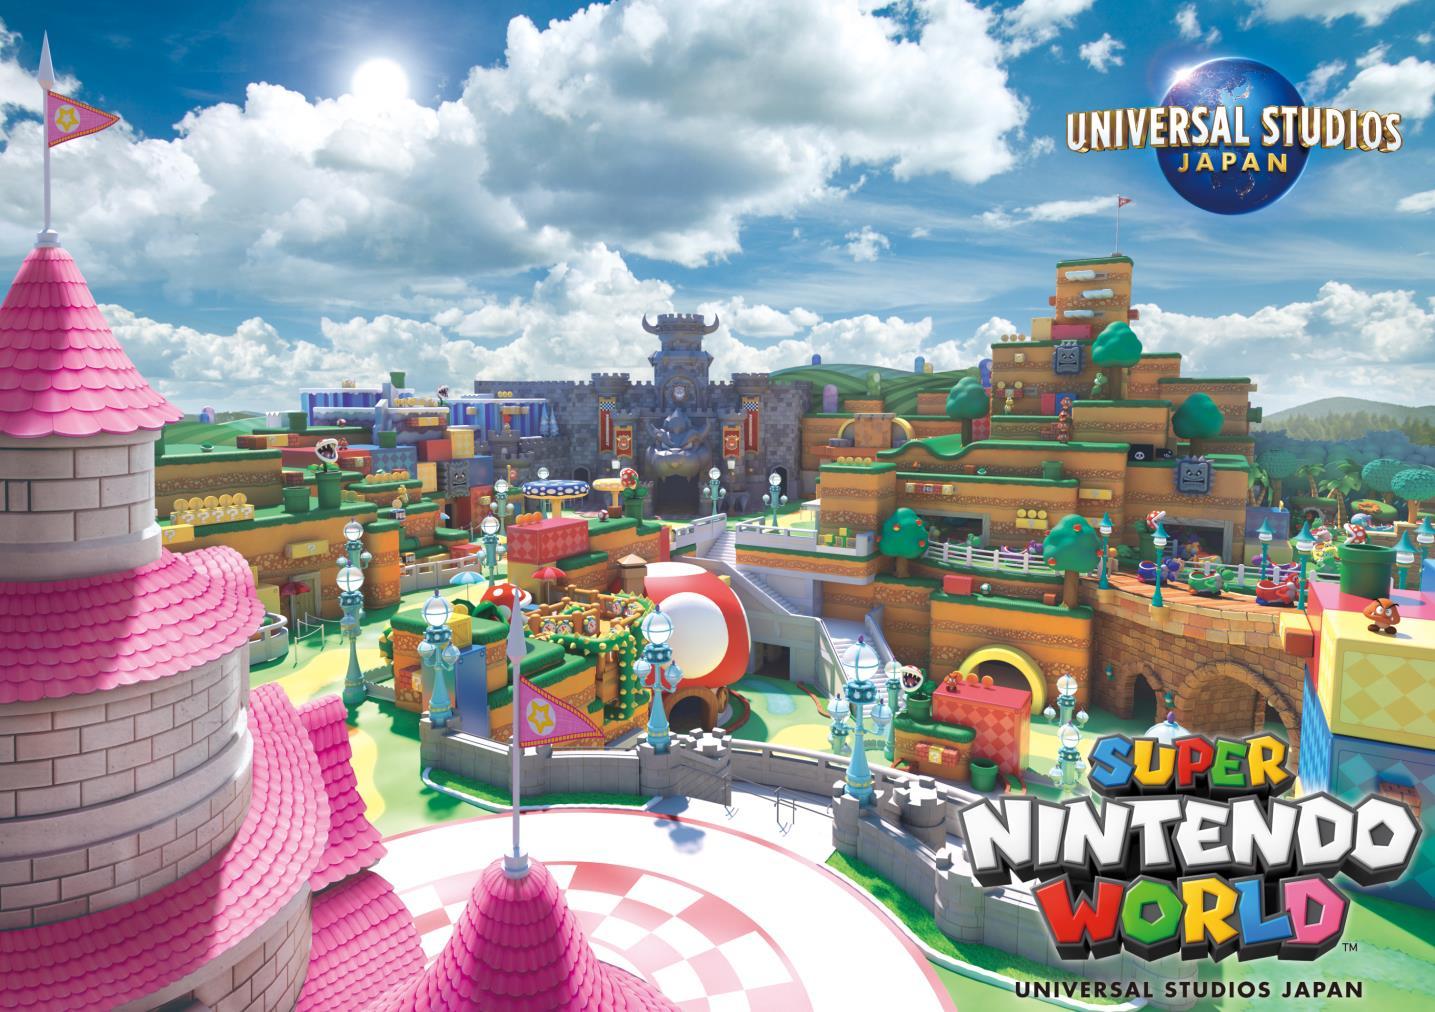 Super Nintendo World Opens In 2020 At Universal Studios Japan